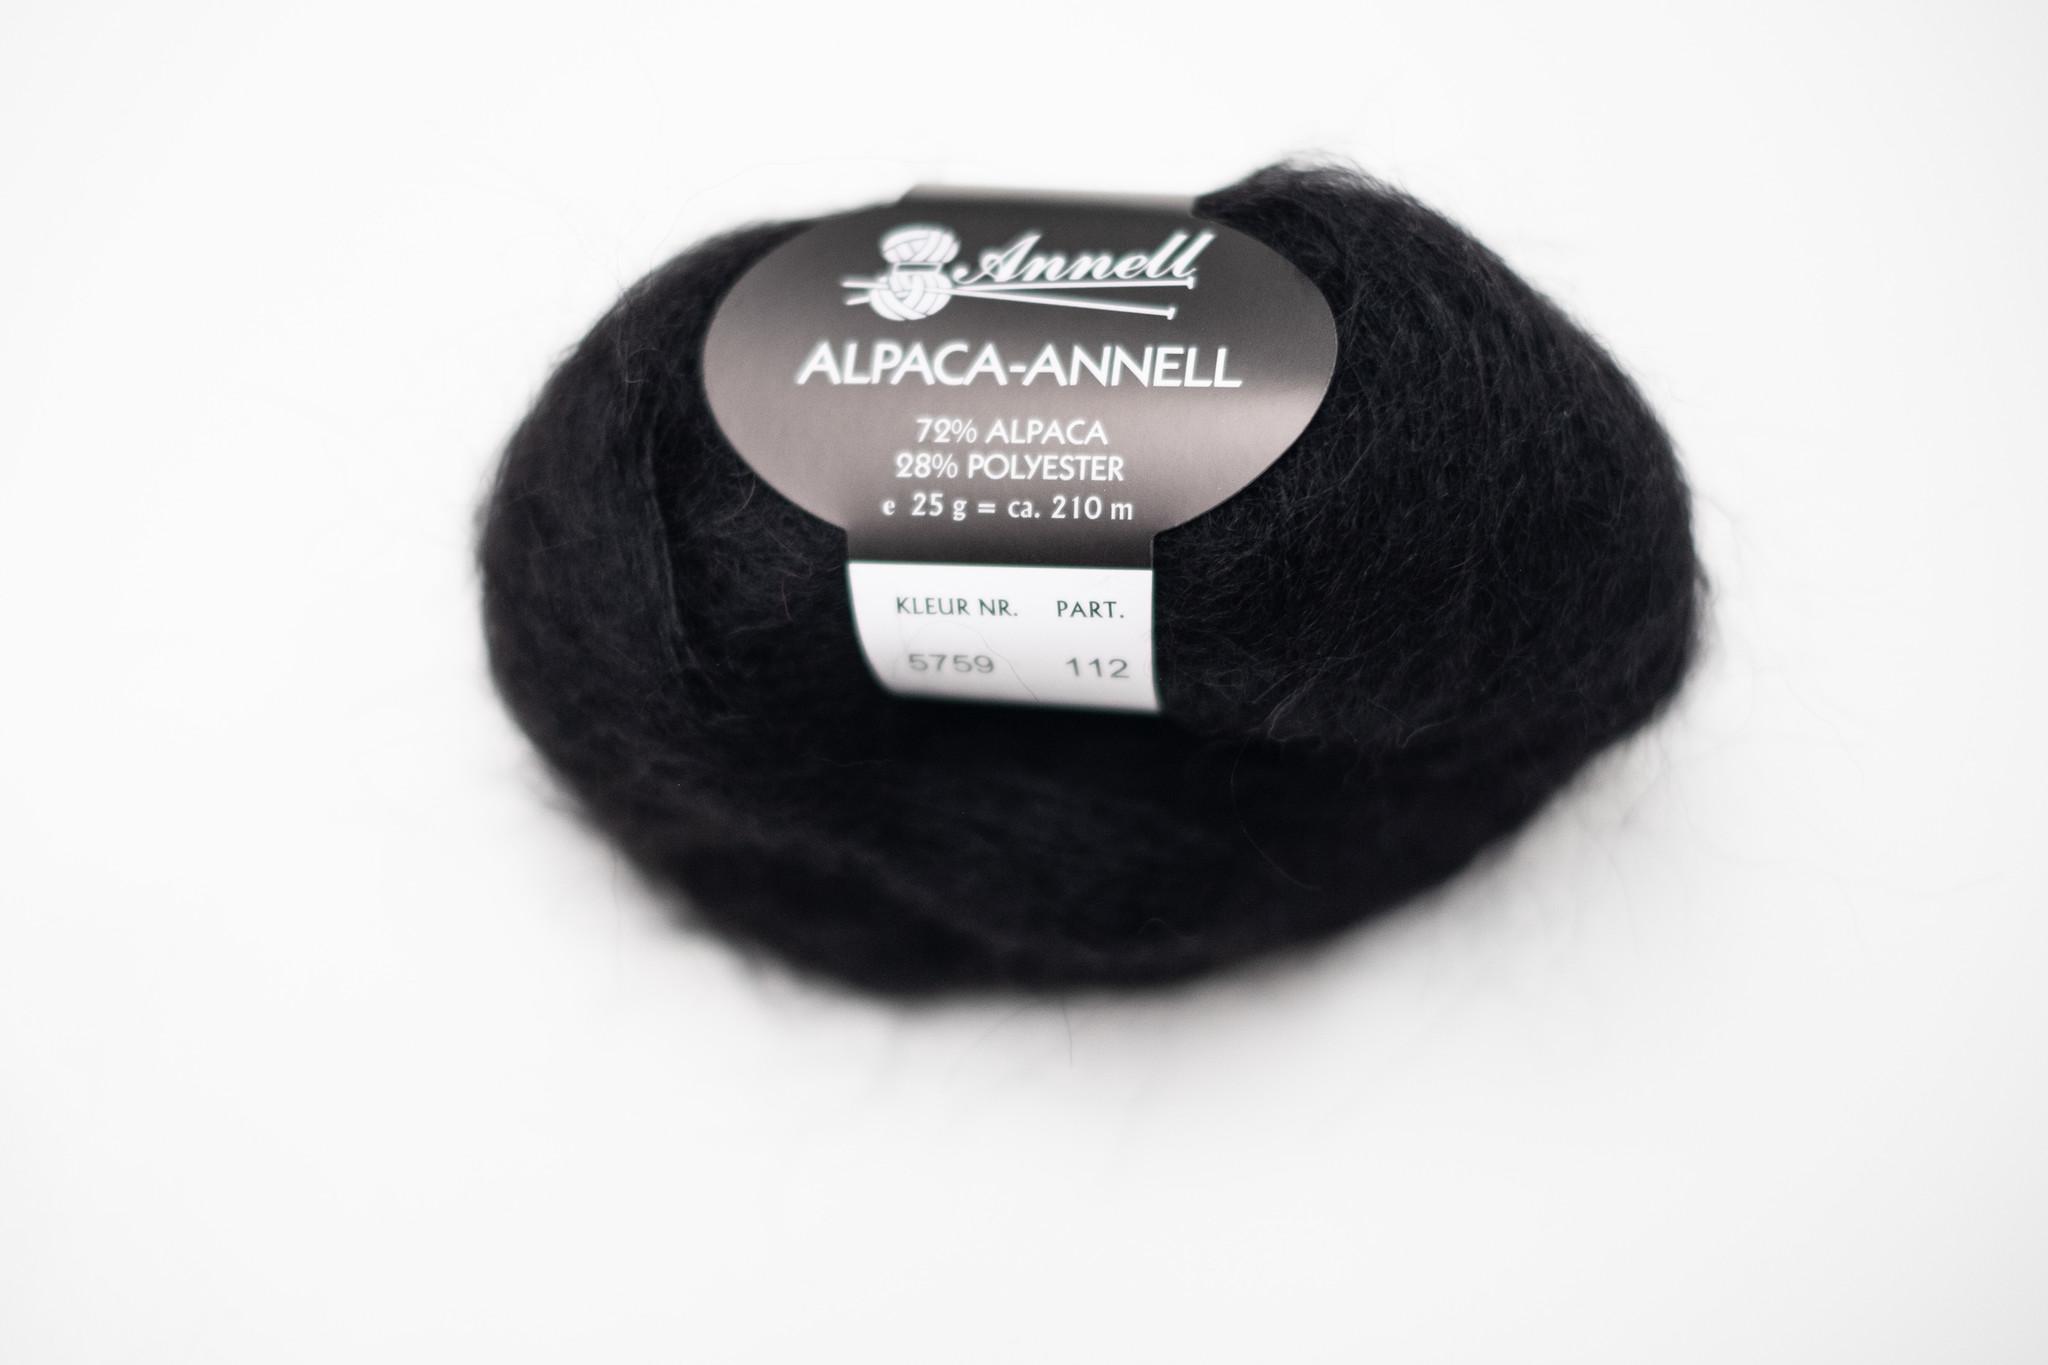 Annell Alpaca-Annell - kleur 5759